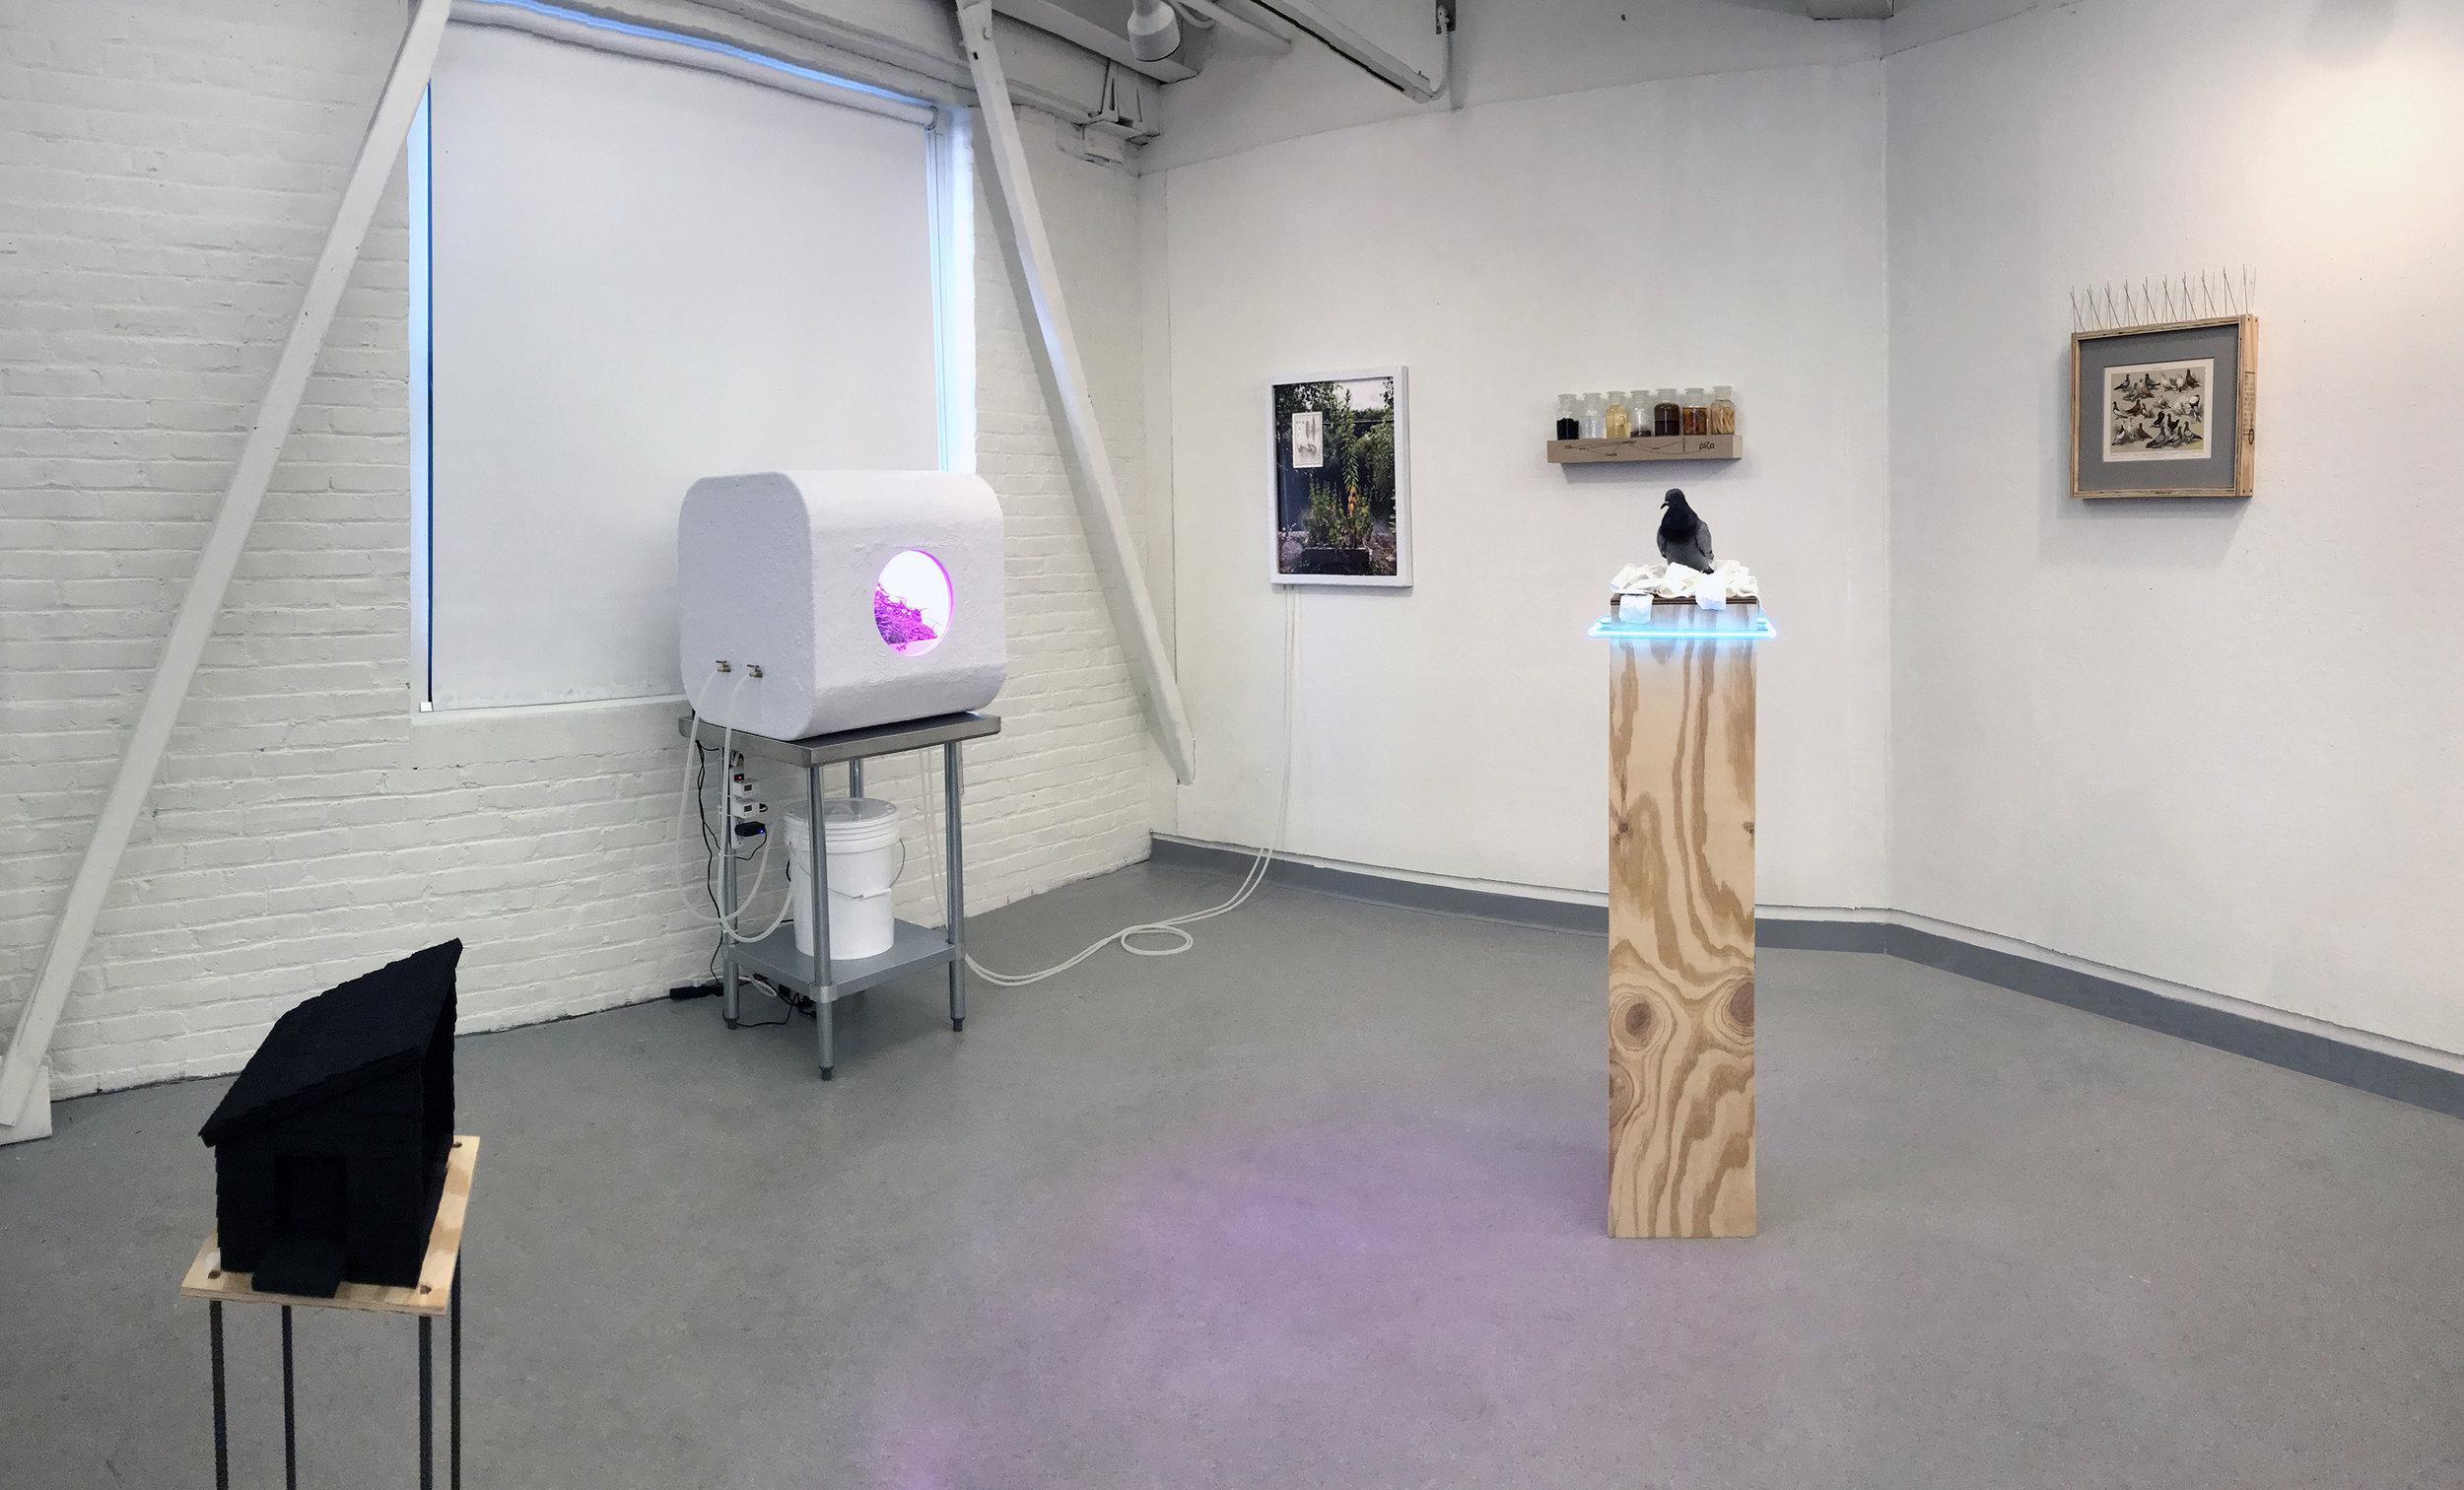 Installation View at NHIA